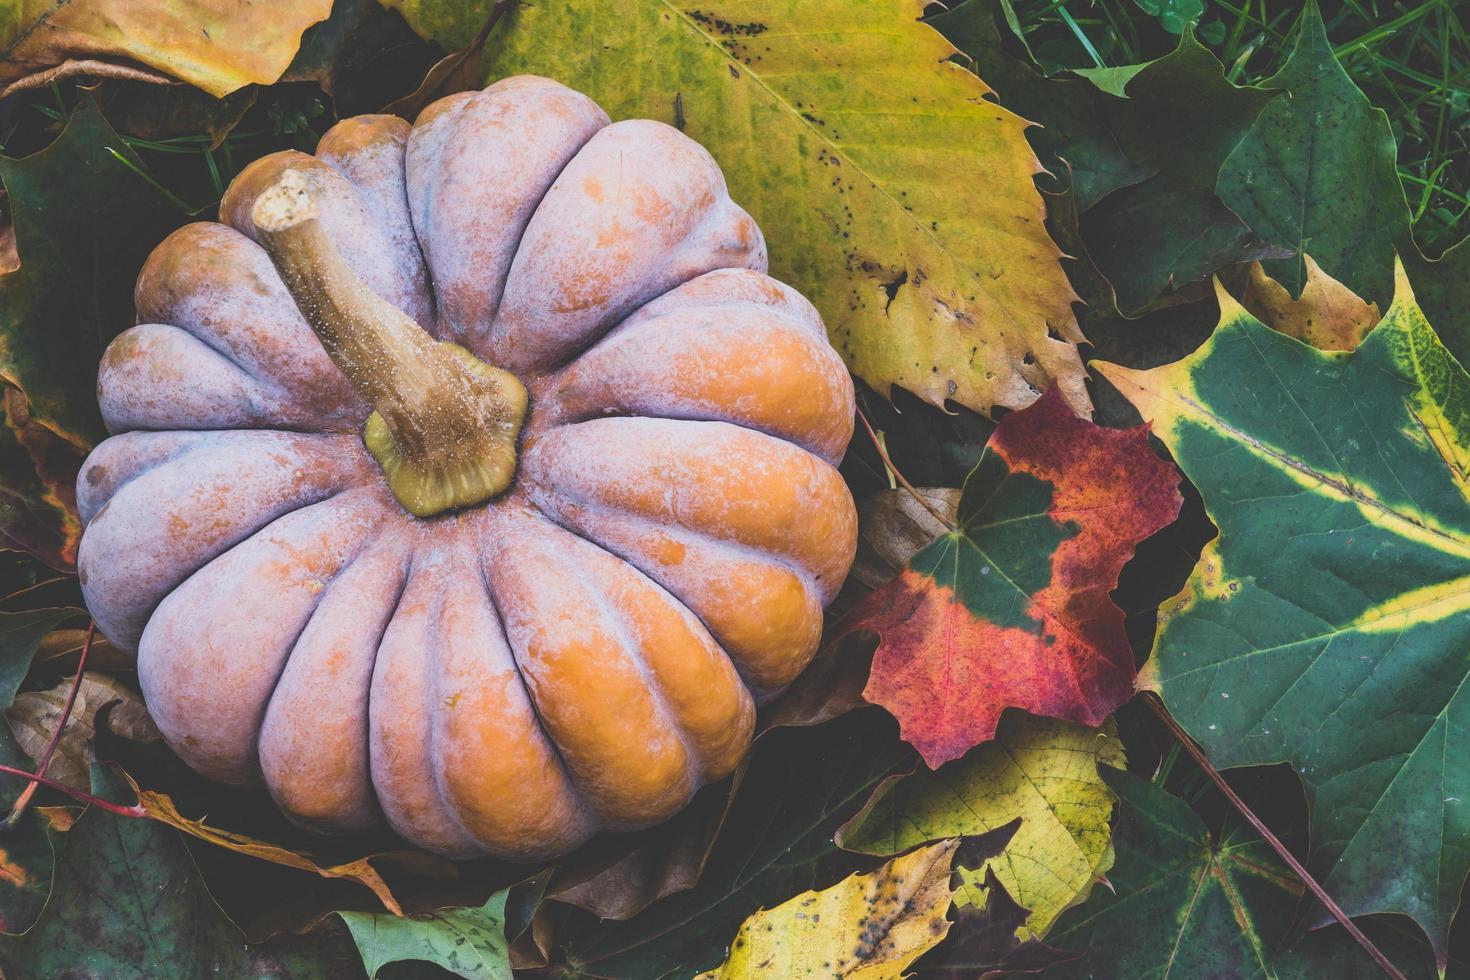 Pumpkin and autumn leaves photo